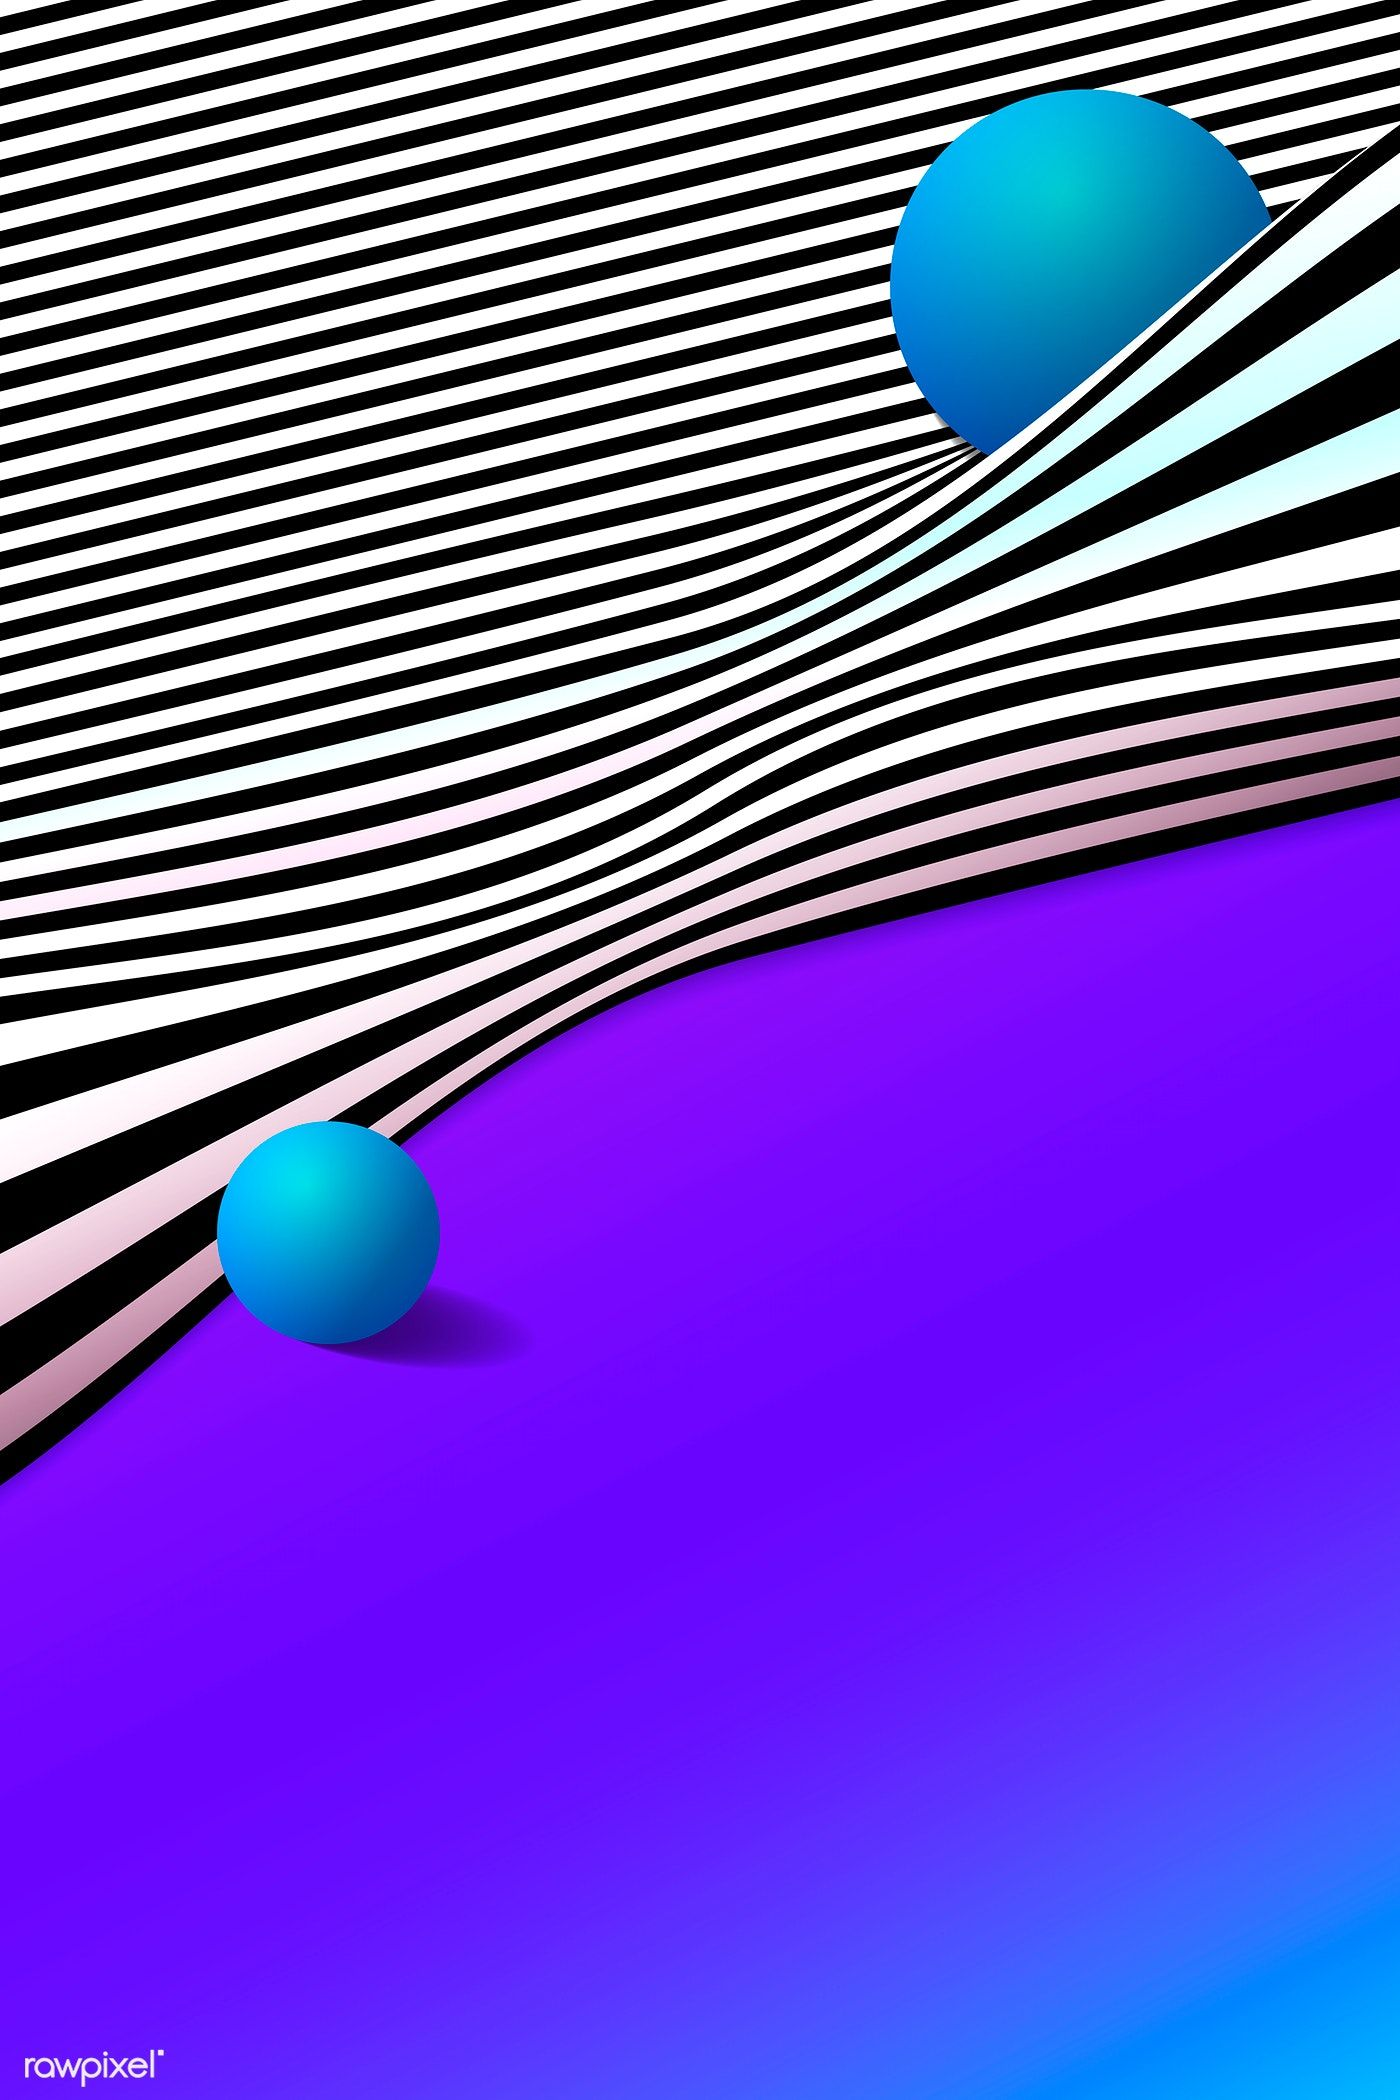 Download Premium Vector Of Purple Abstract Background Design Vector 1206229 Background Design Abstract Backgrounds Background Design Vector